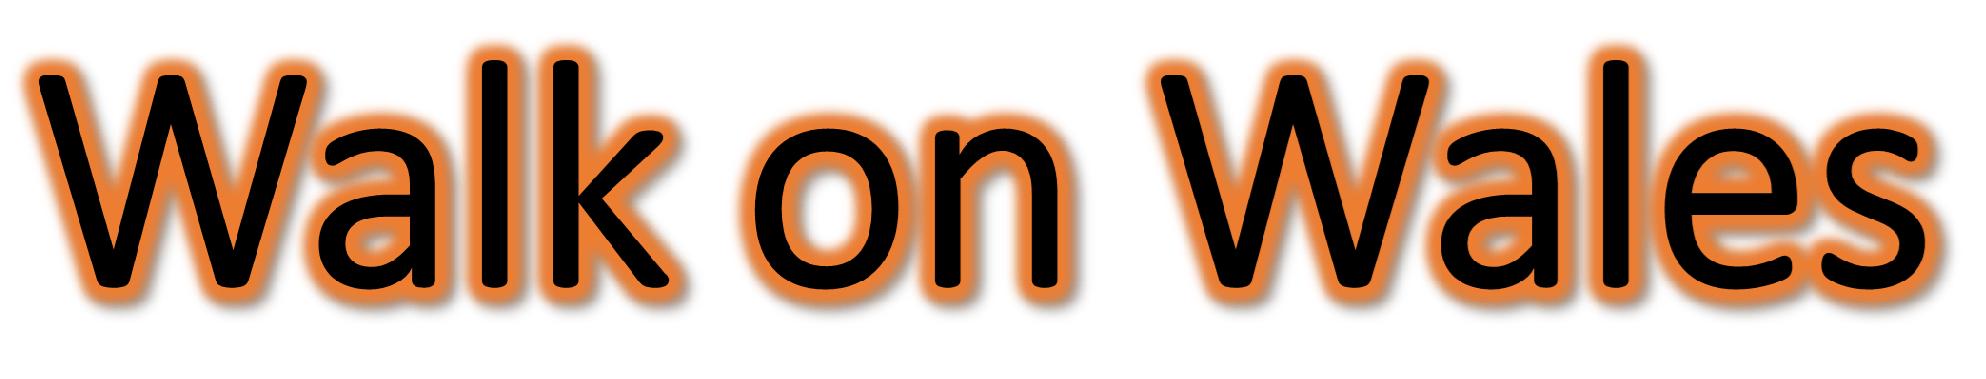 PG-WOW